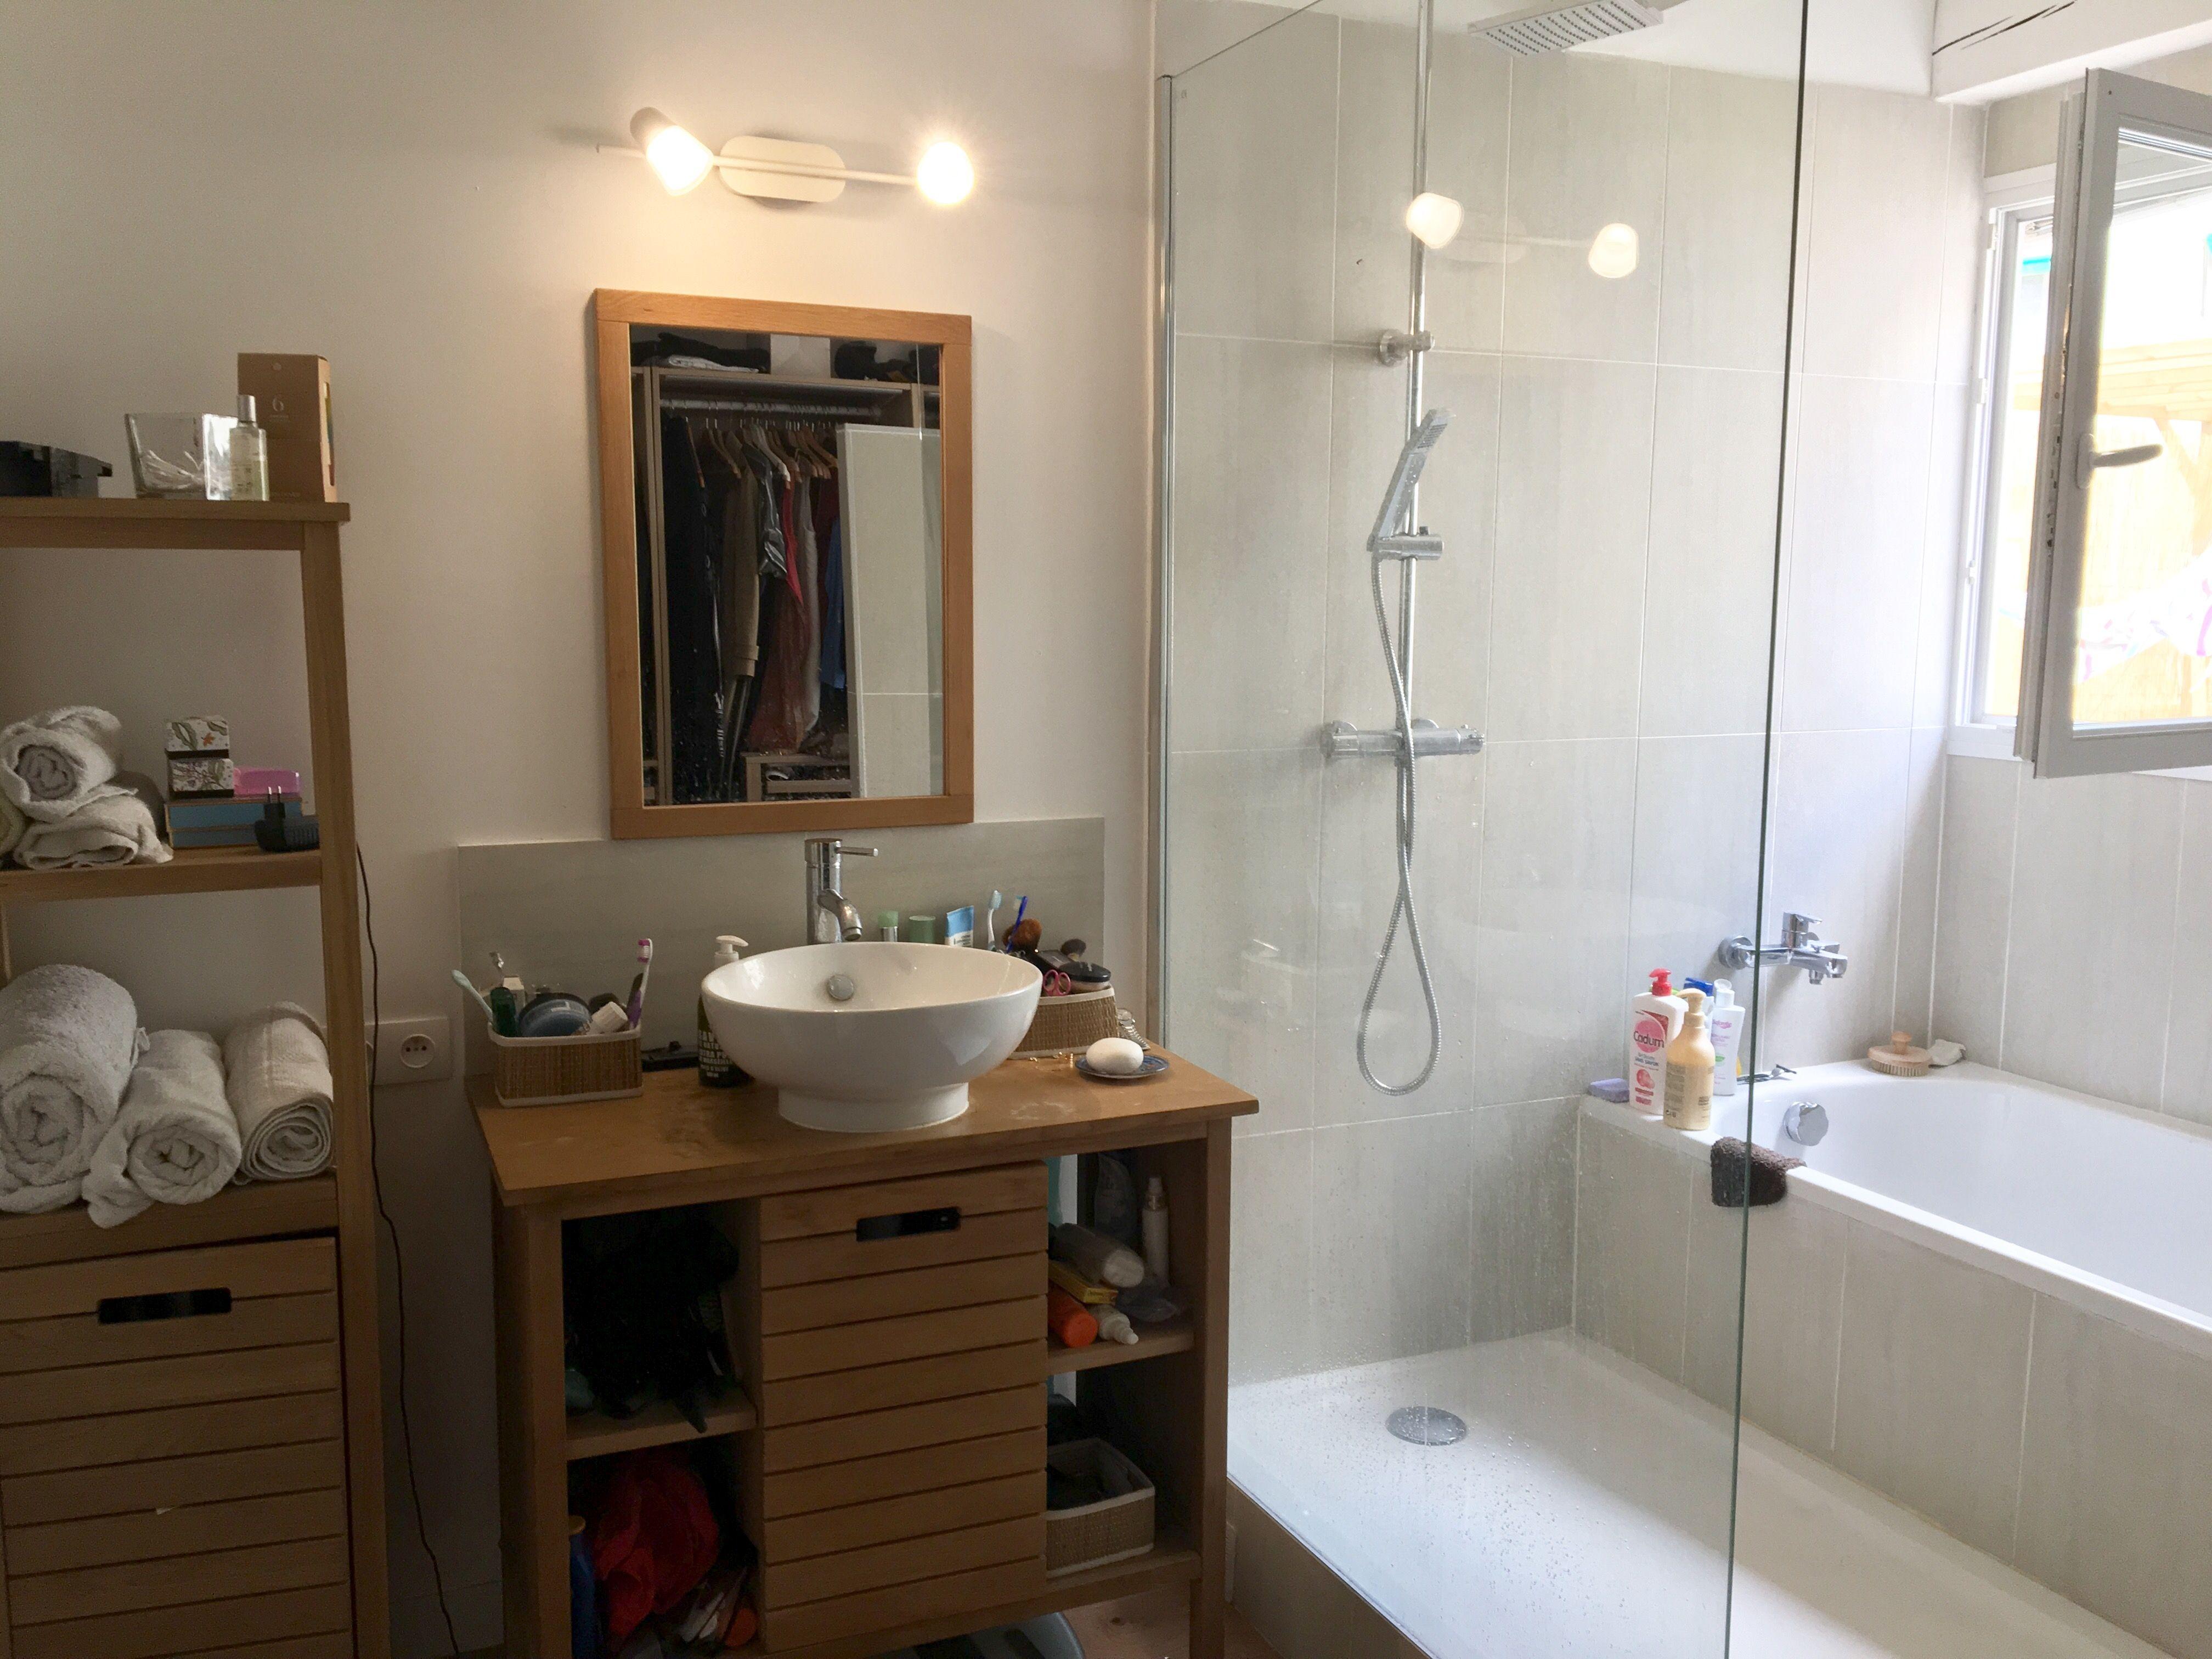 castorama salle de bain receveur de douche